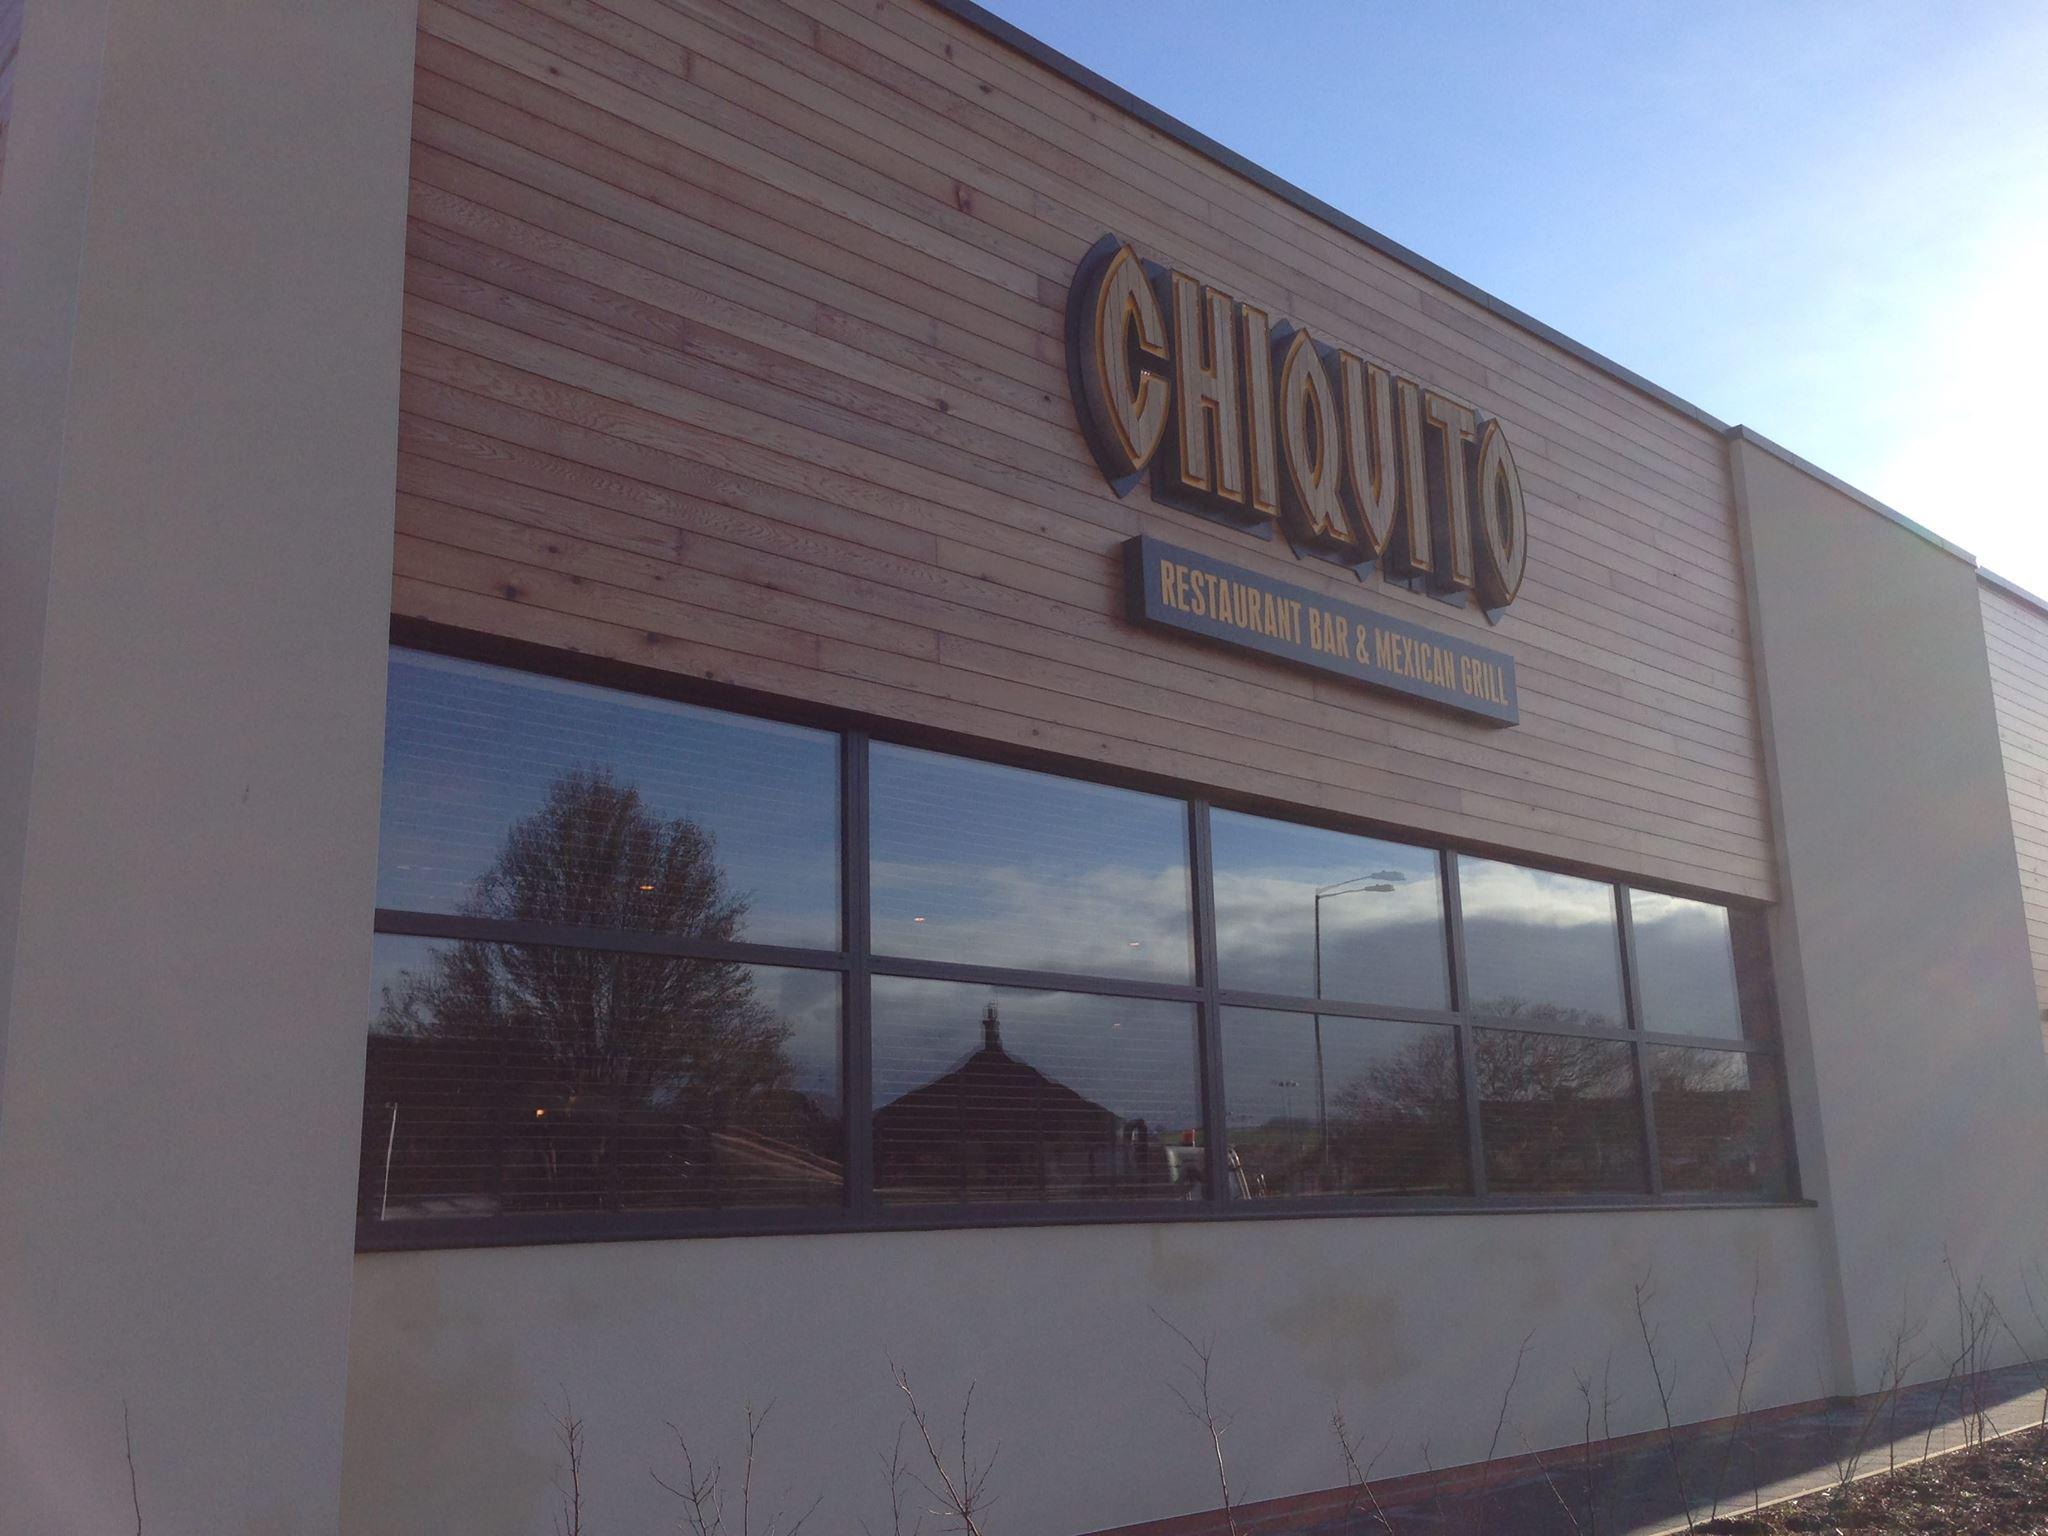 Chiquito Restaurant Glass Front